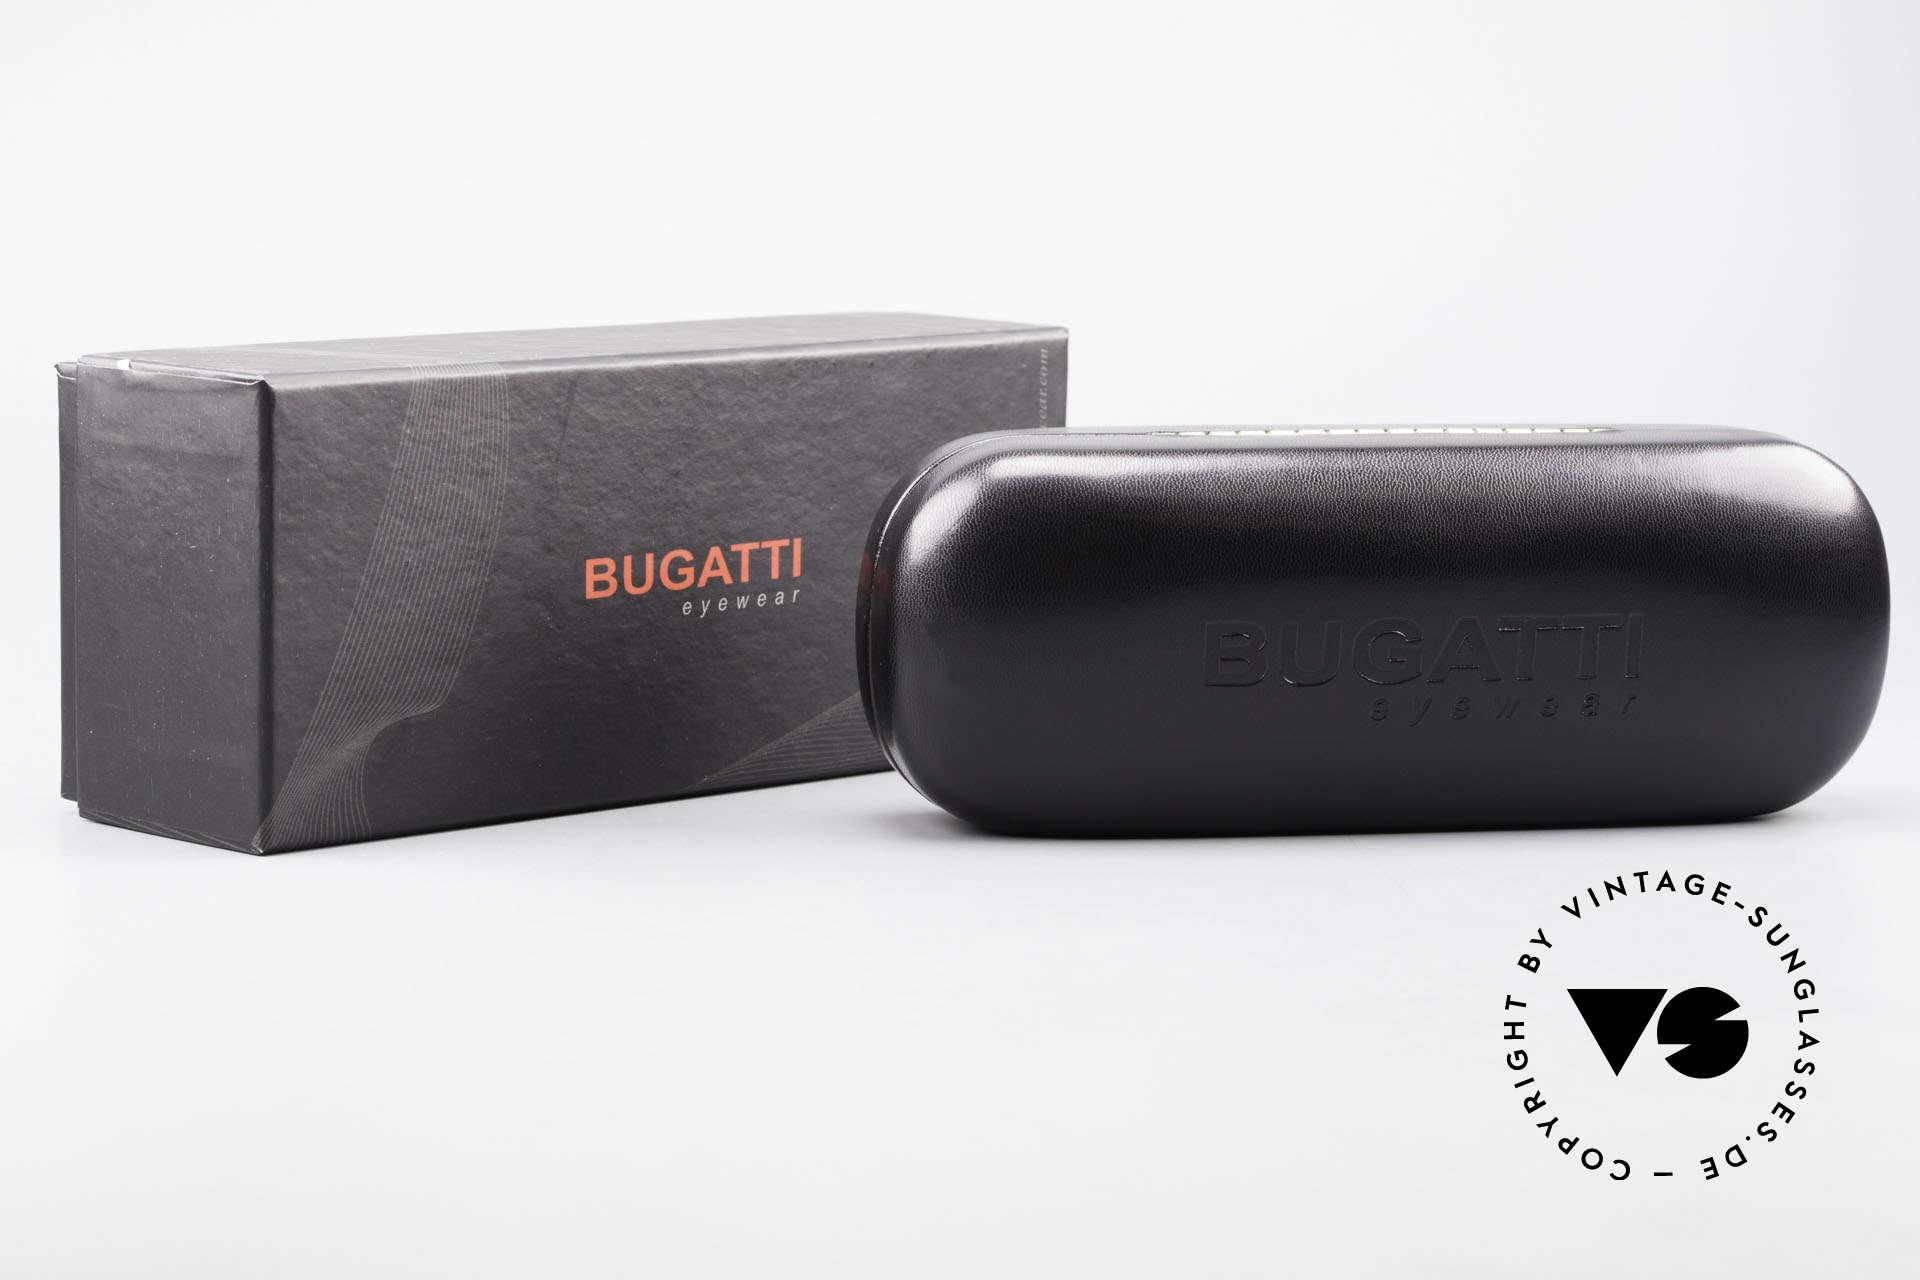 Bugatti 486 Square Men's Designer Glasses, Size: medium, Made for Men